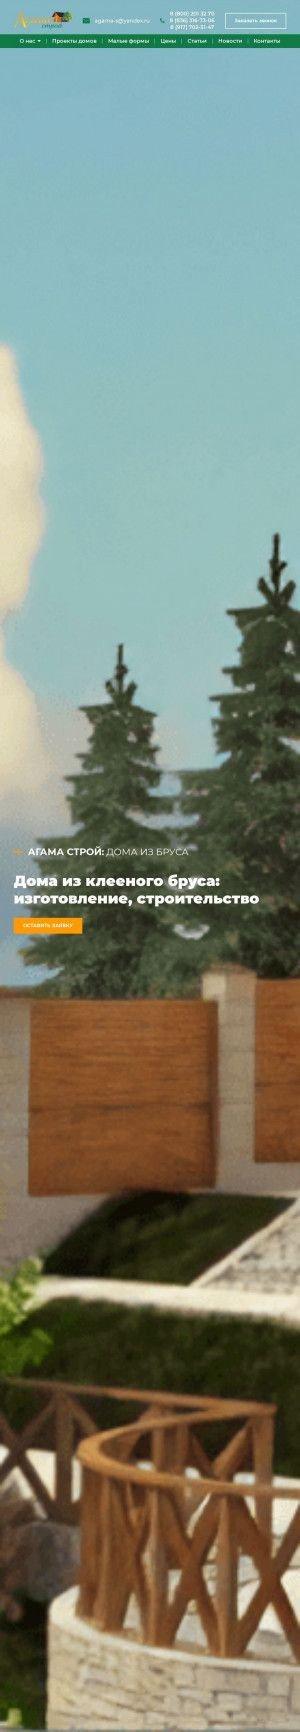 Предпросмотр для agama-stroi.ru — Агама-строй